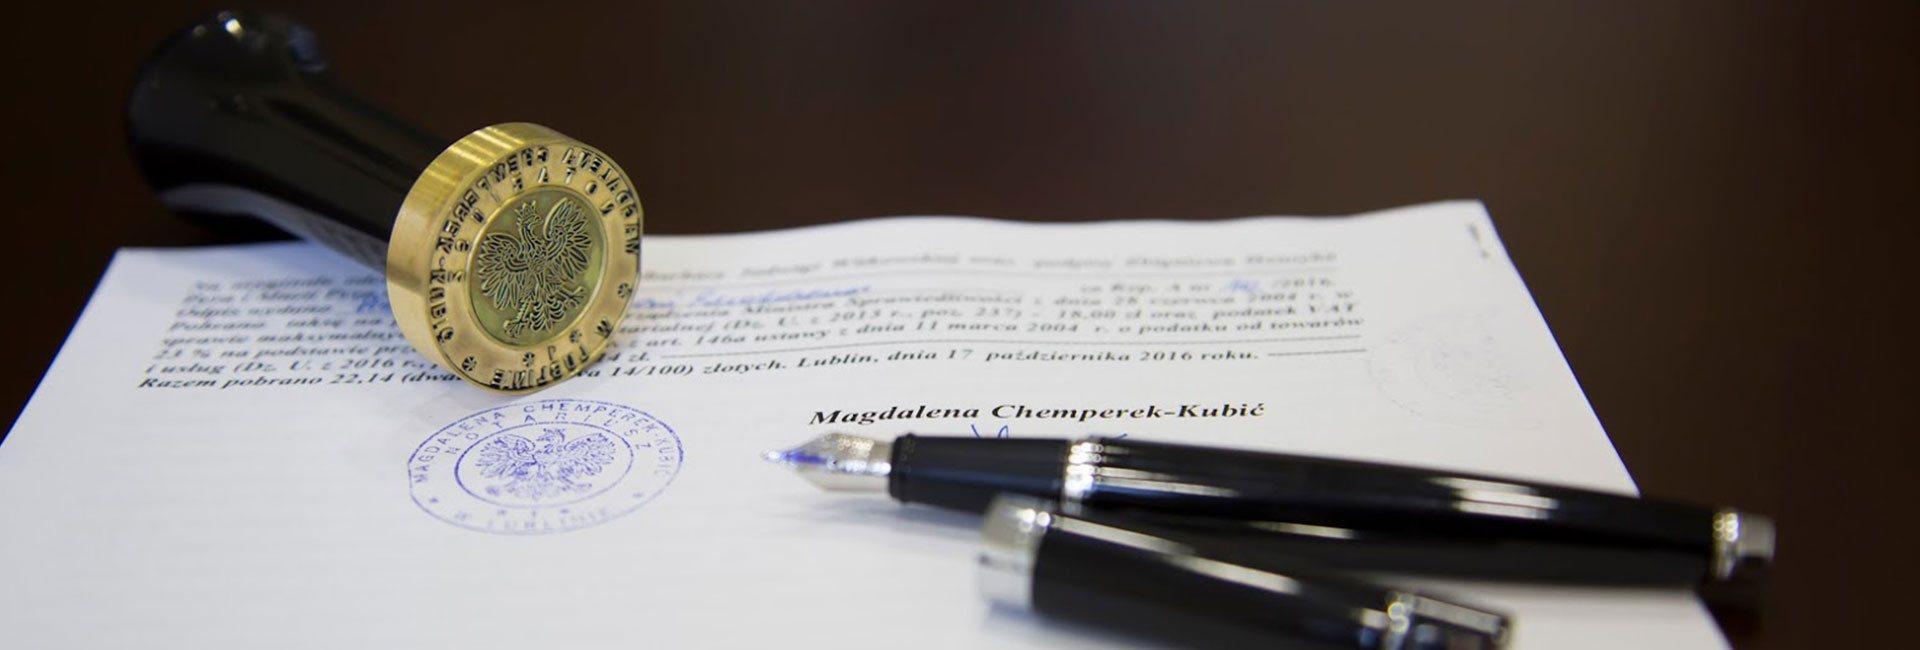 Kancelaria Notarialna - Magdalena Chemperek-Kubić